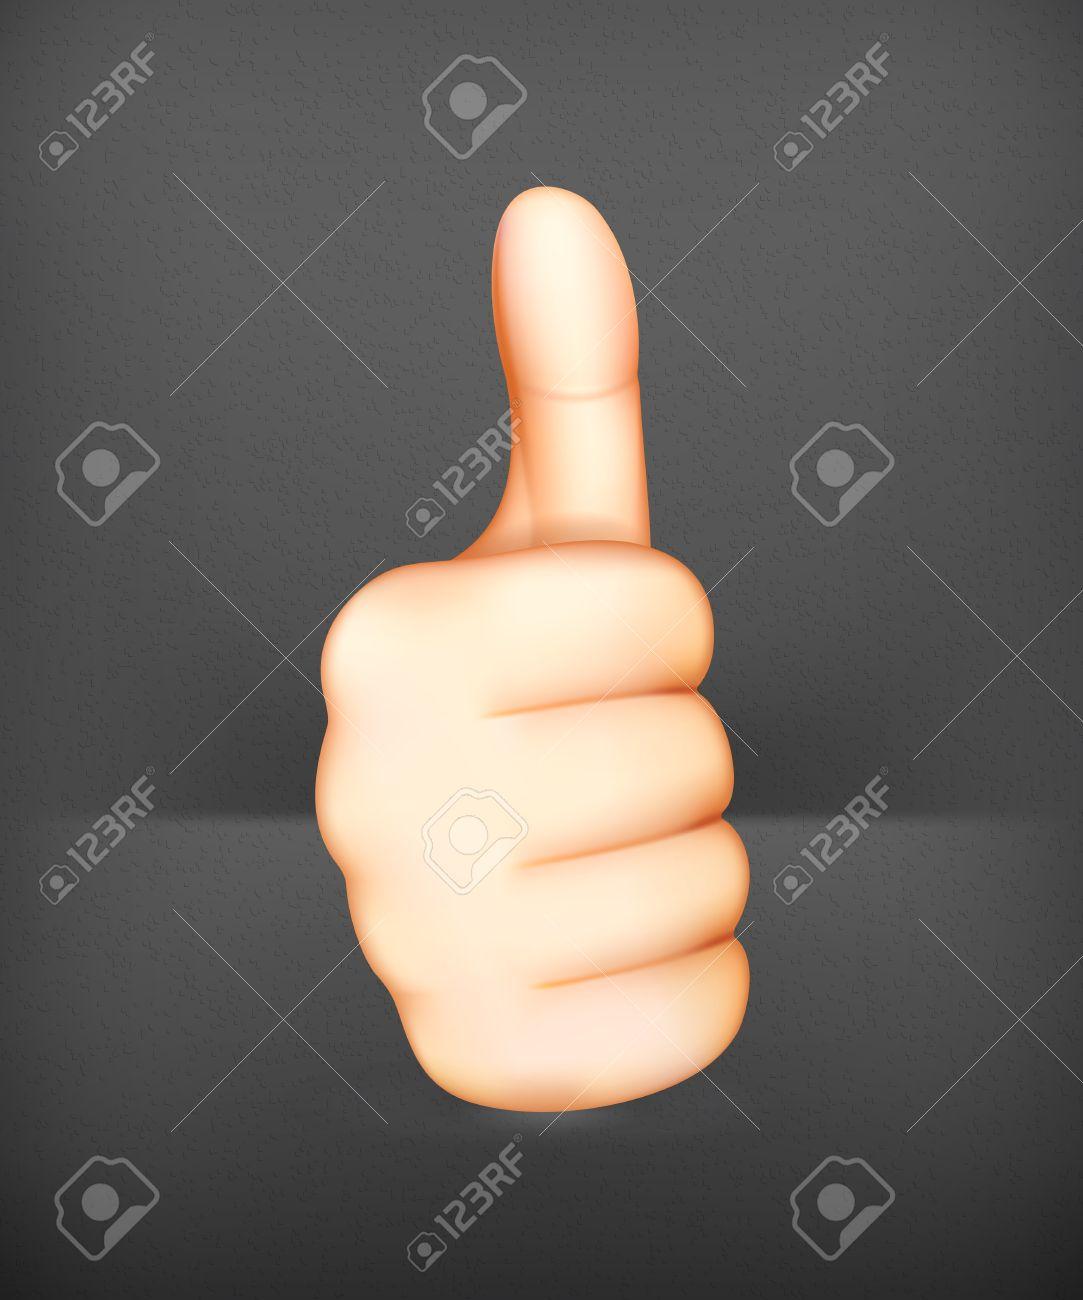 Thumb up Stock Vector - 19713191